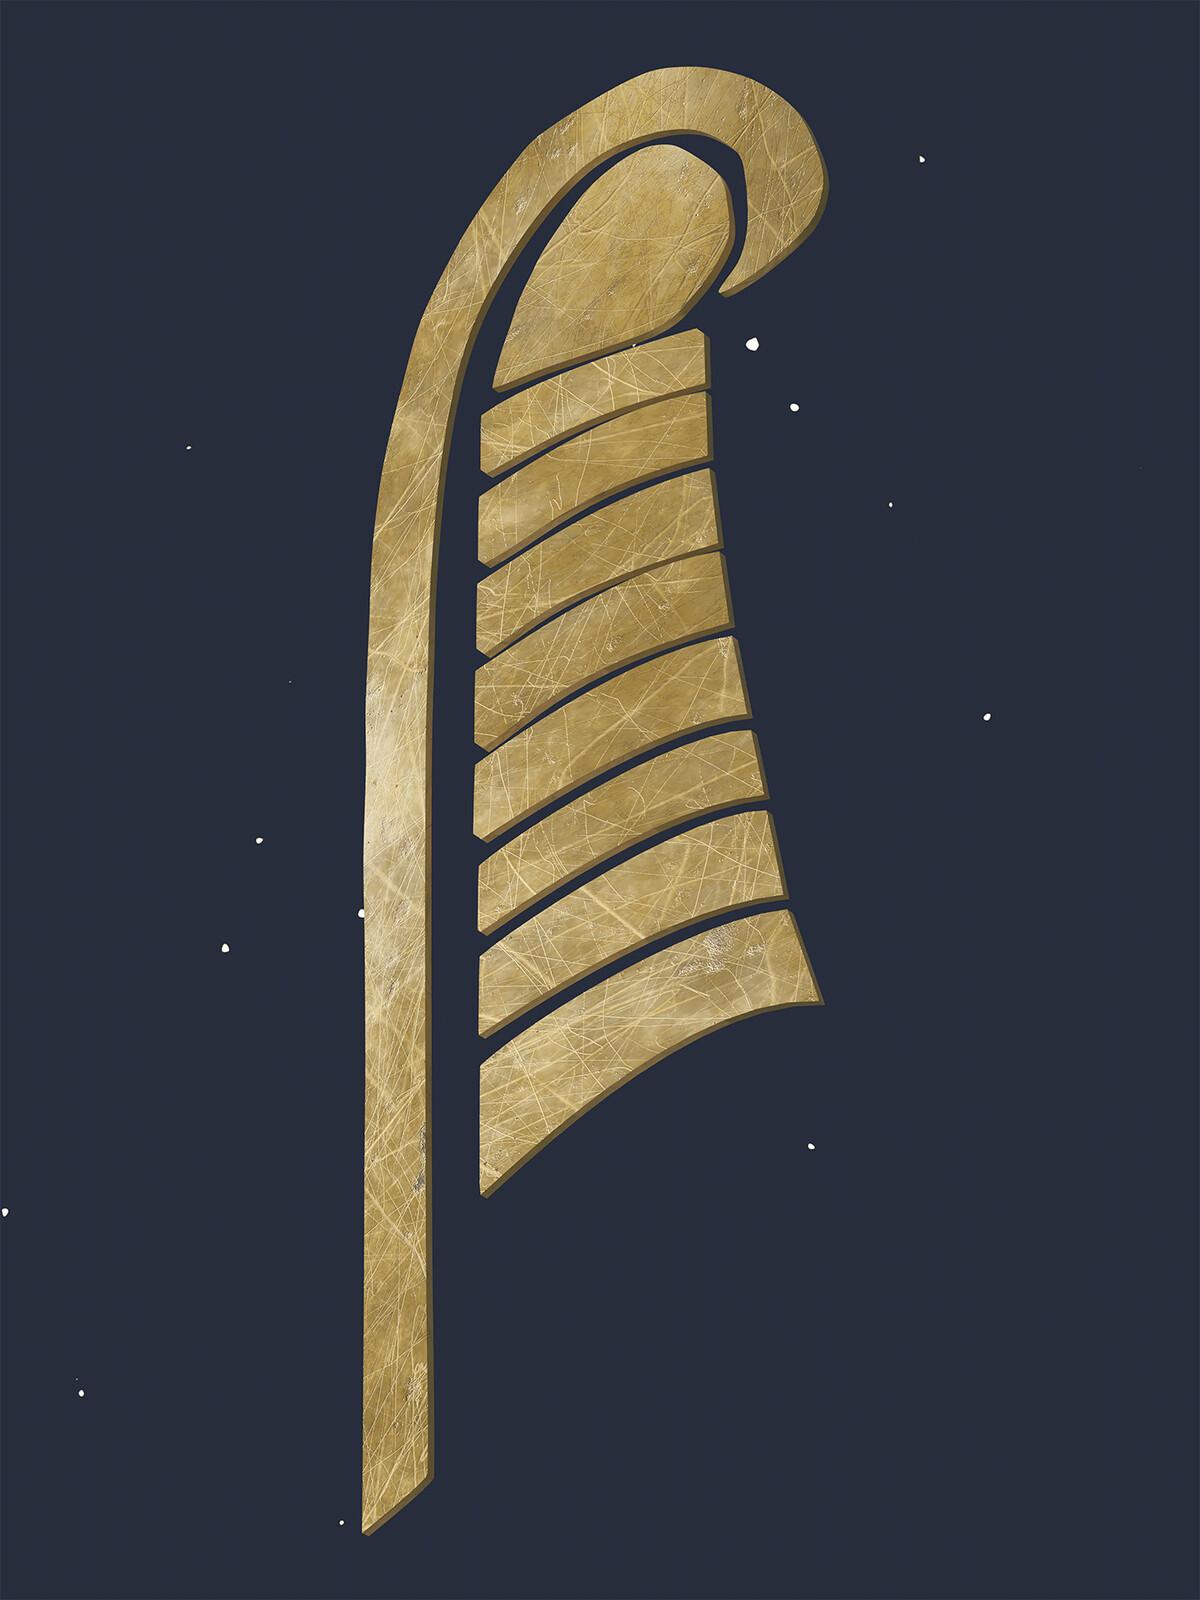 Blender: Feather